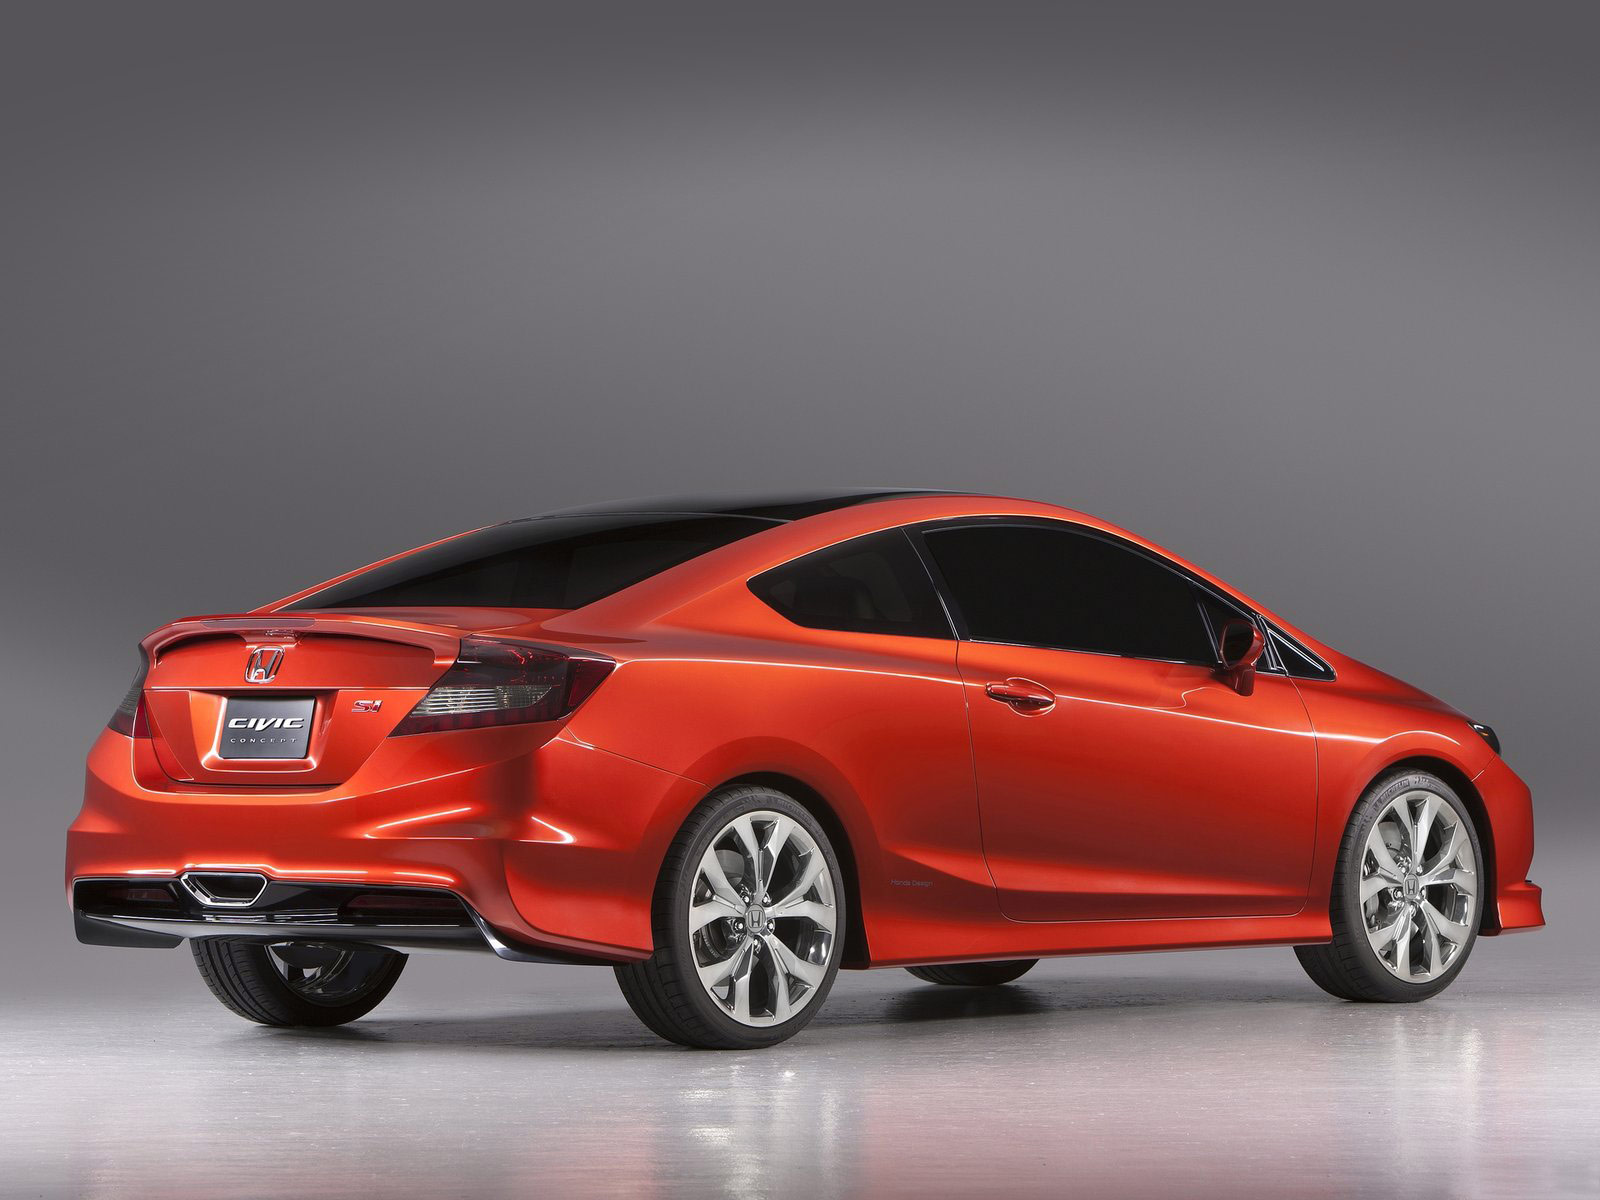 2011 Honda Civic Si Concept Japan Automobiles